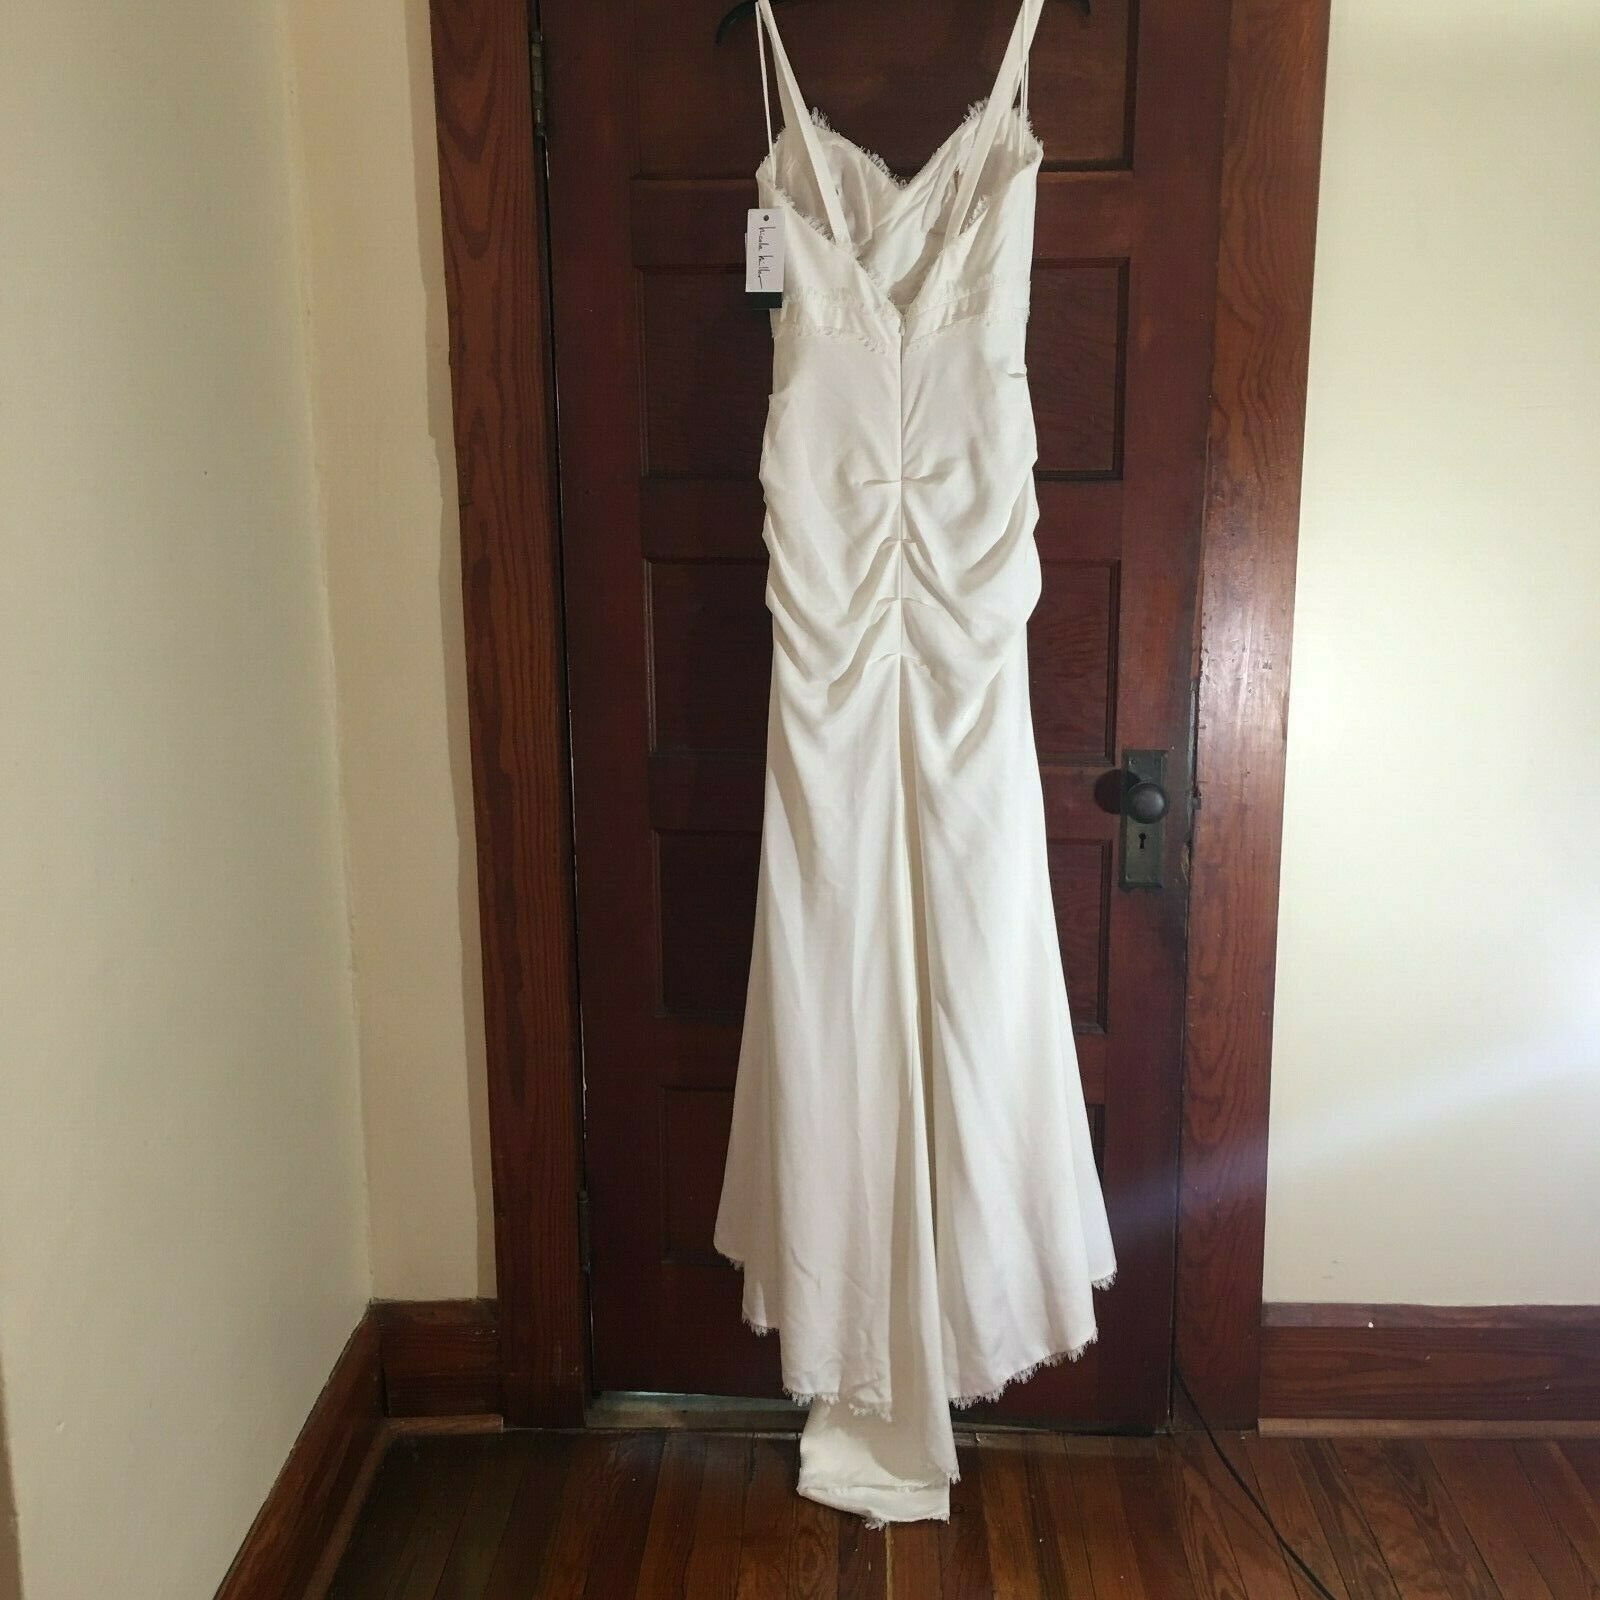 Nicole Miller Tonya Women's Wedding Dress Bridal Gown Antiqu White Size 4 $1200